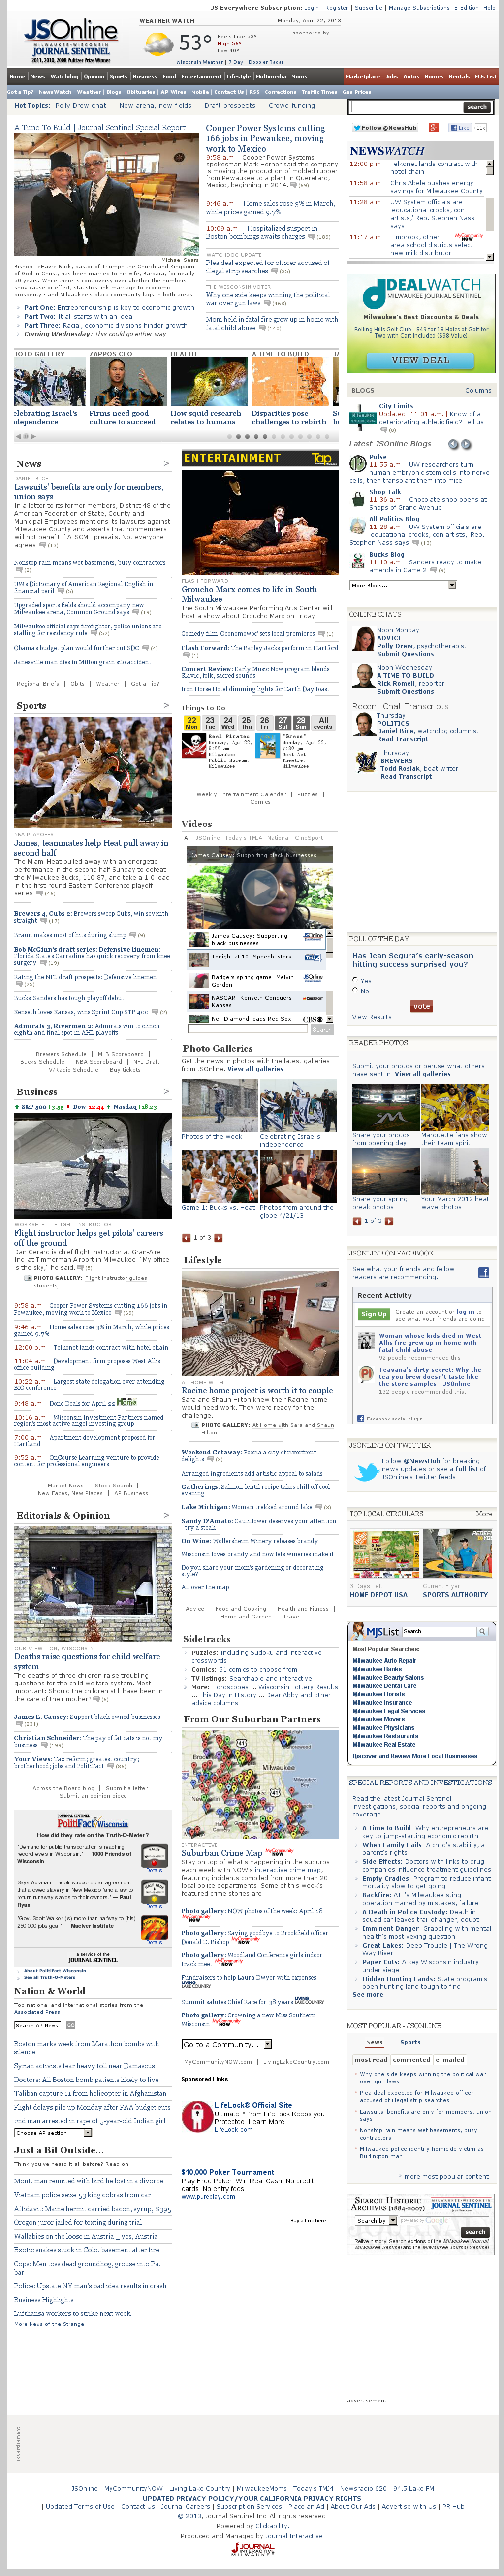 Milwaukee Journal Sentinel at Monday April 22, 2013, 5:13 p.m. UTC